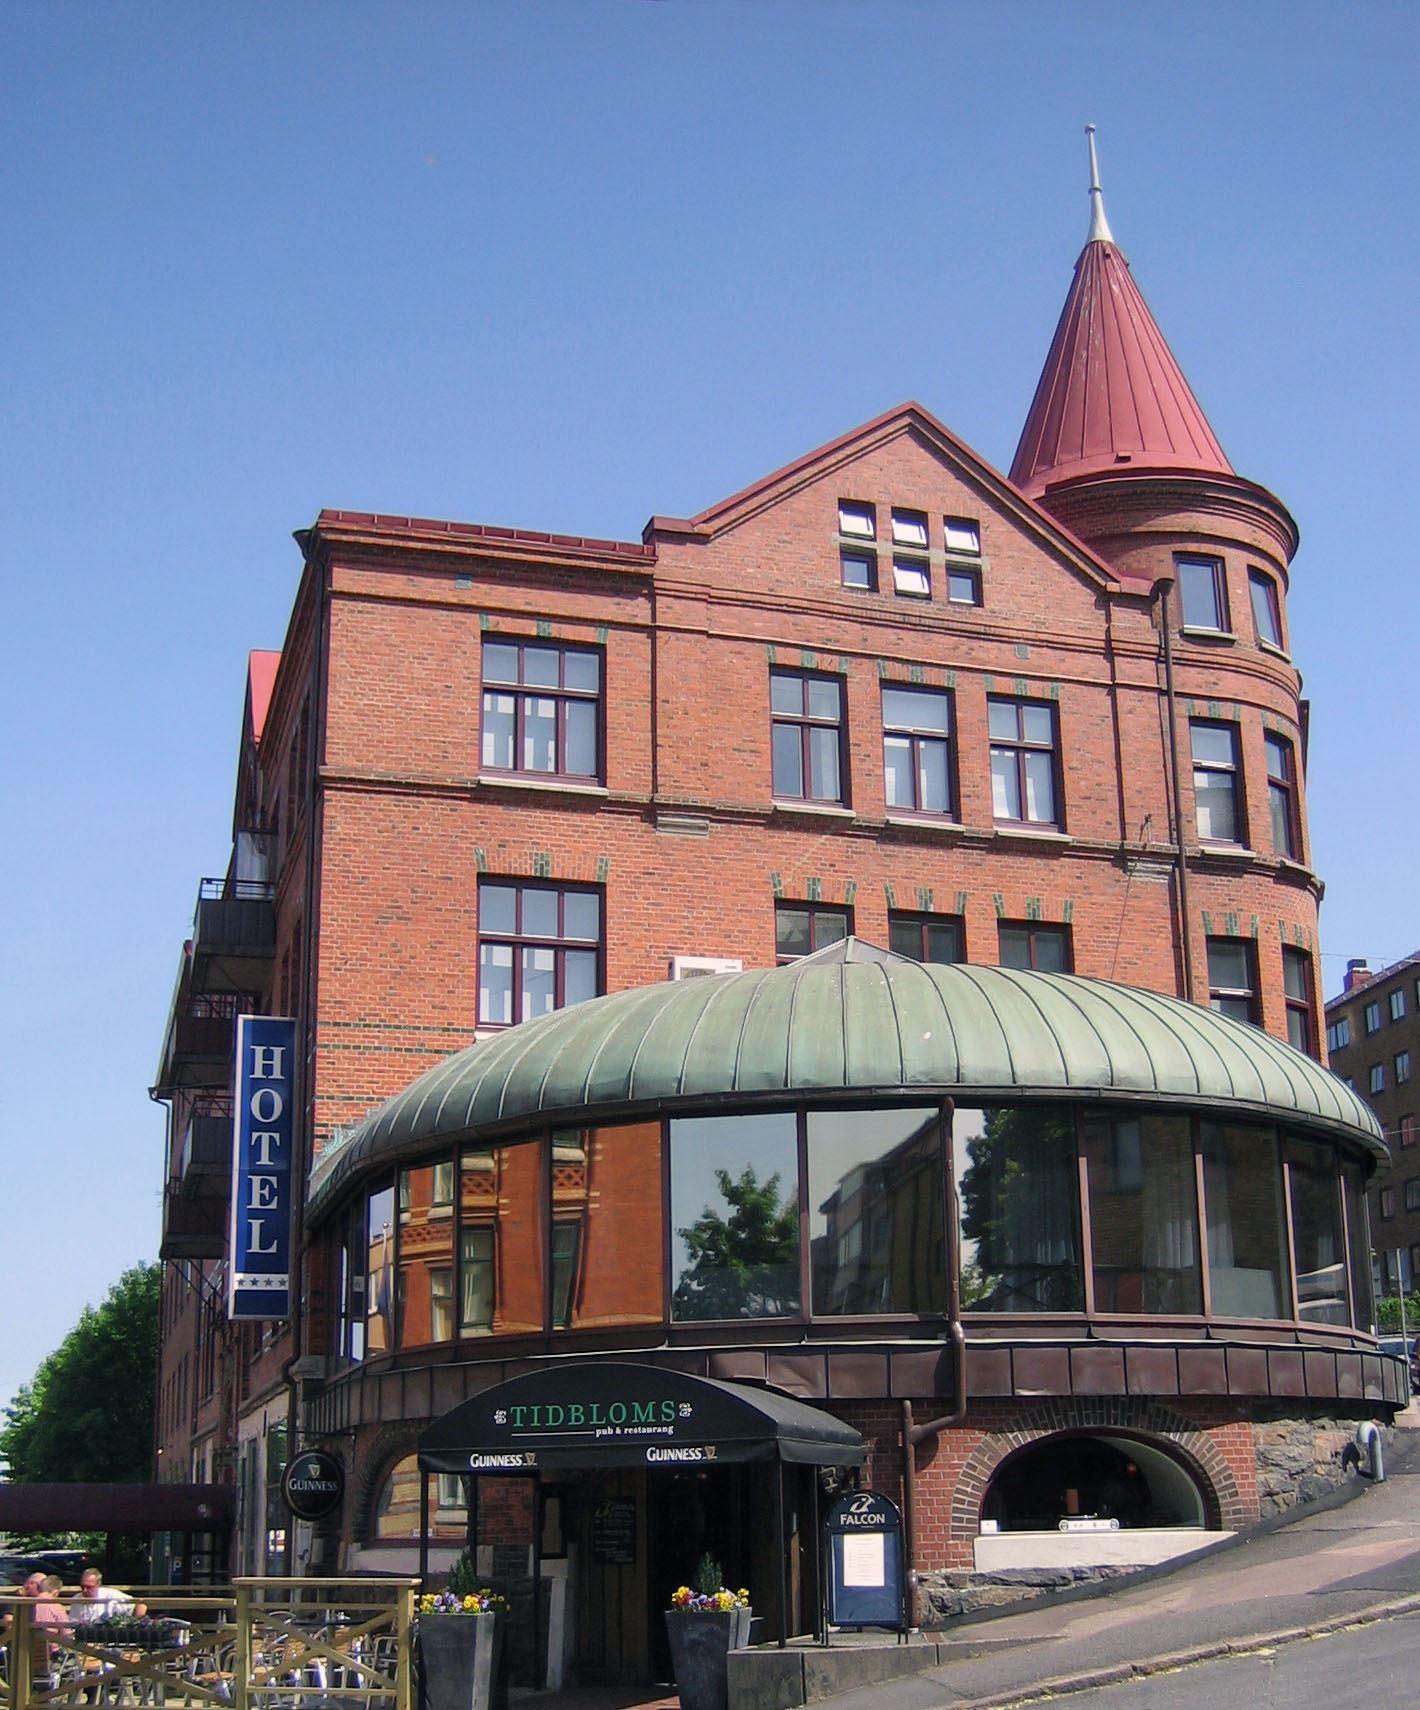 Tidbloms Hotel